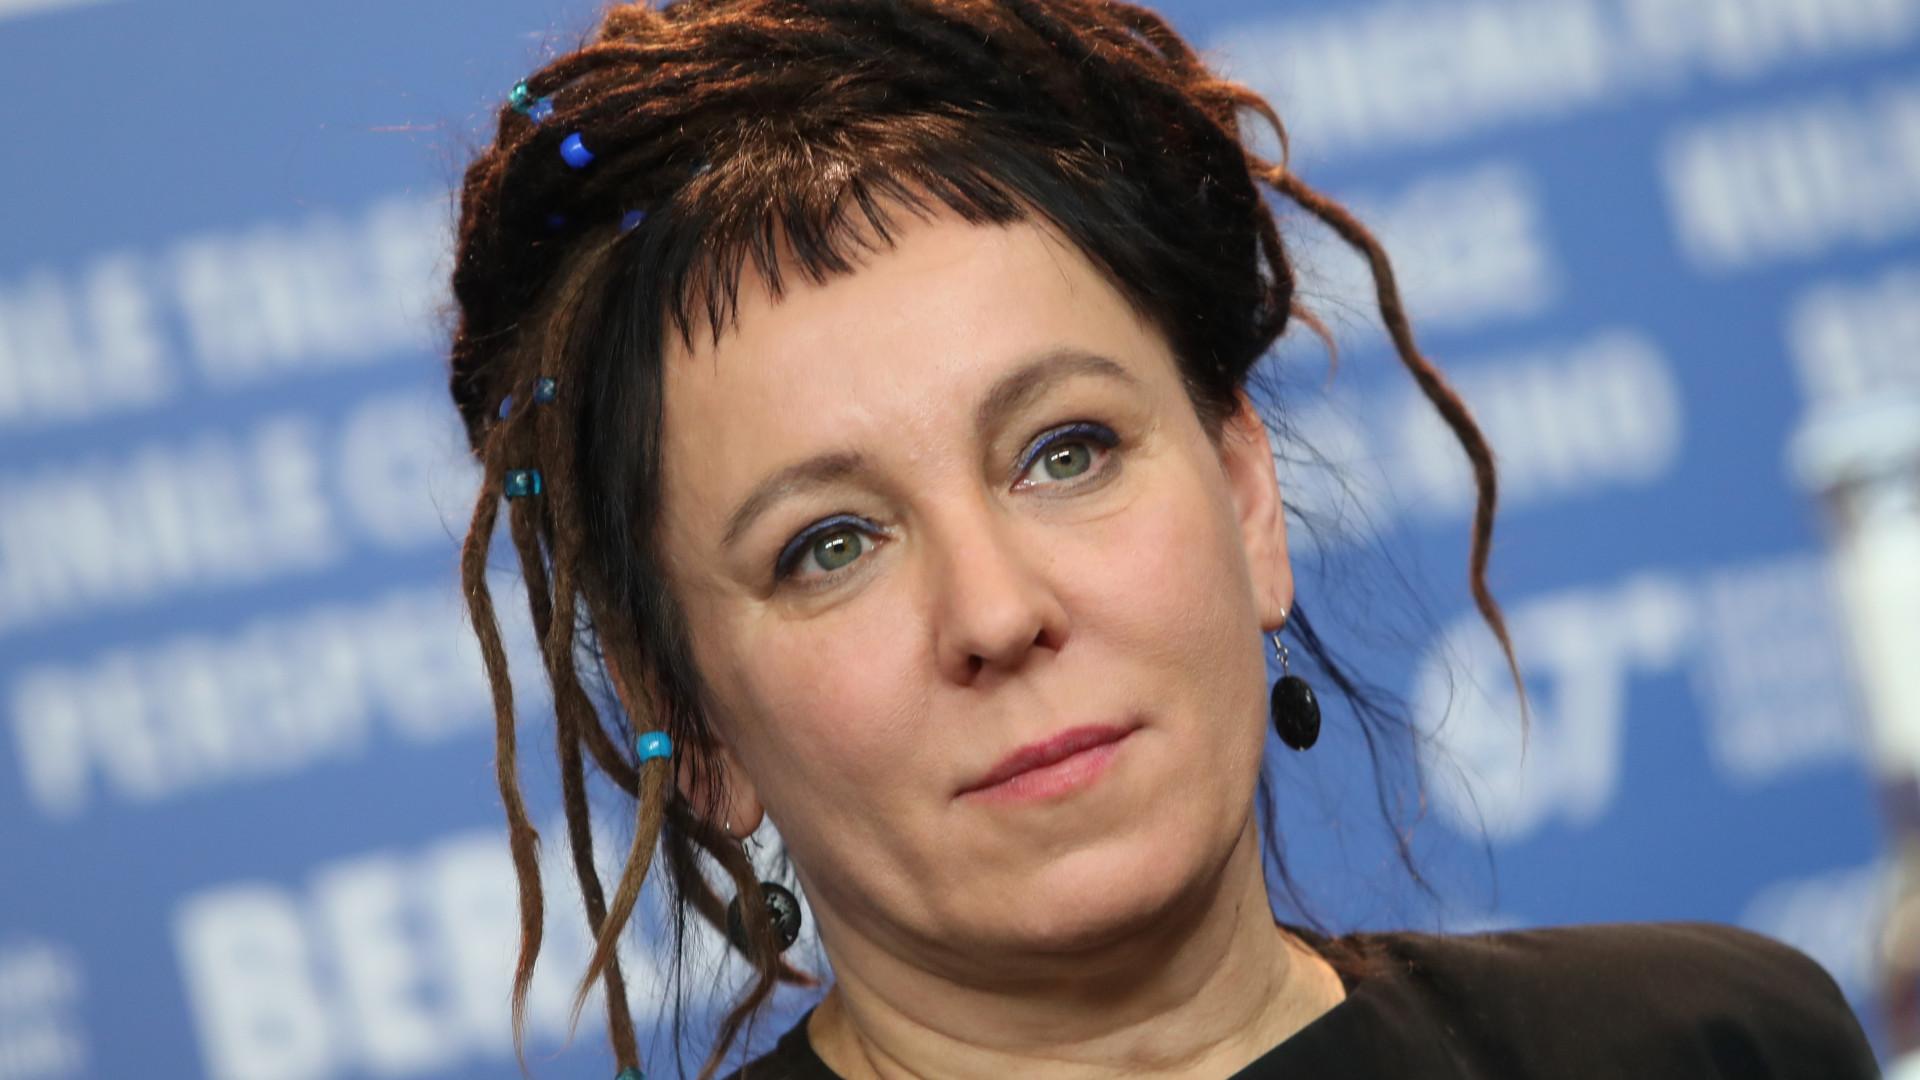 Prémio Man Booker Internacional atribuído a 'Flights' de Olga Tokarczuk